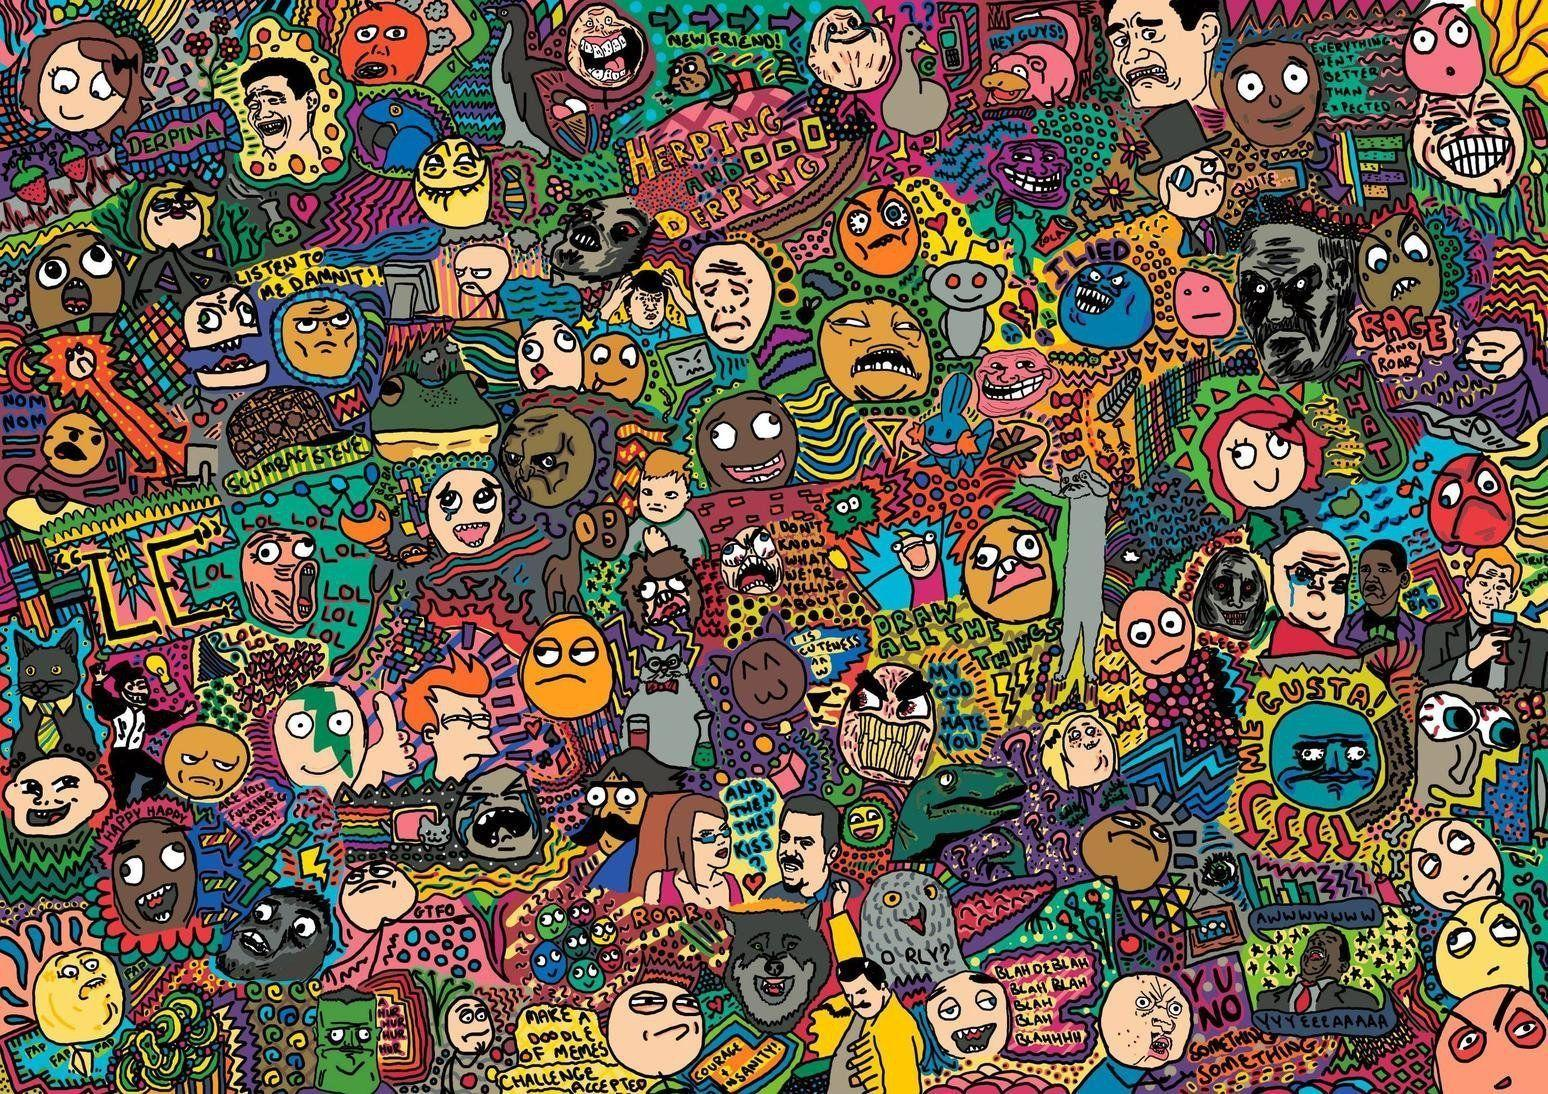 2020 Memes Wallpapers - Wallpaper Cave